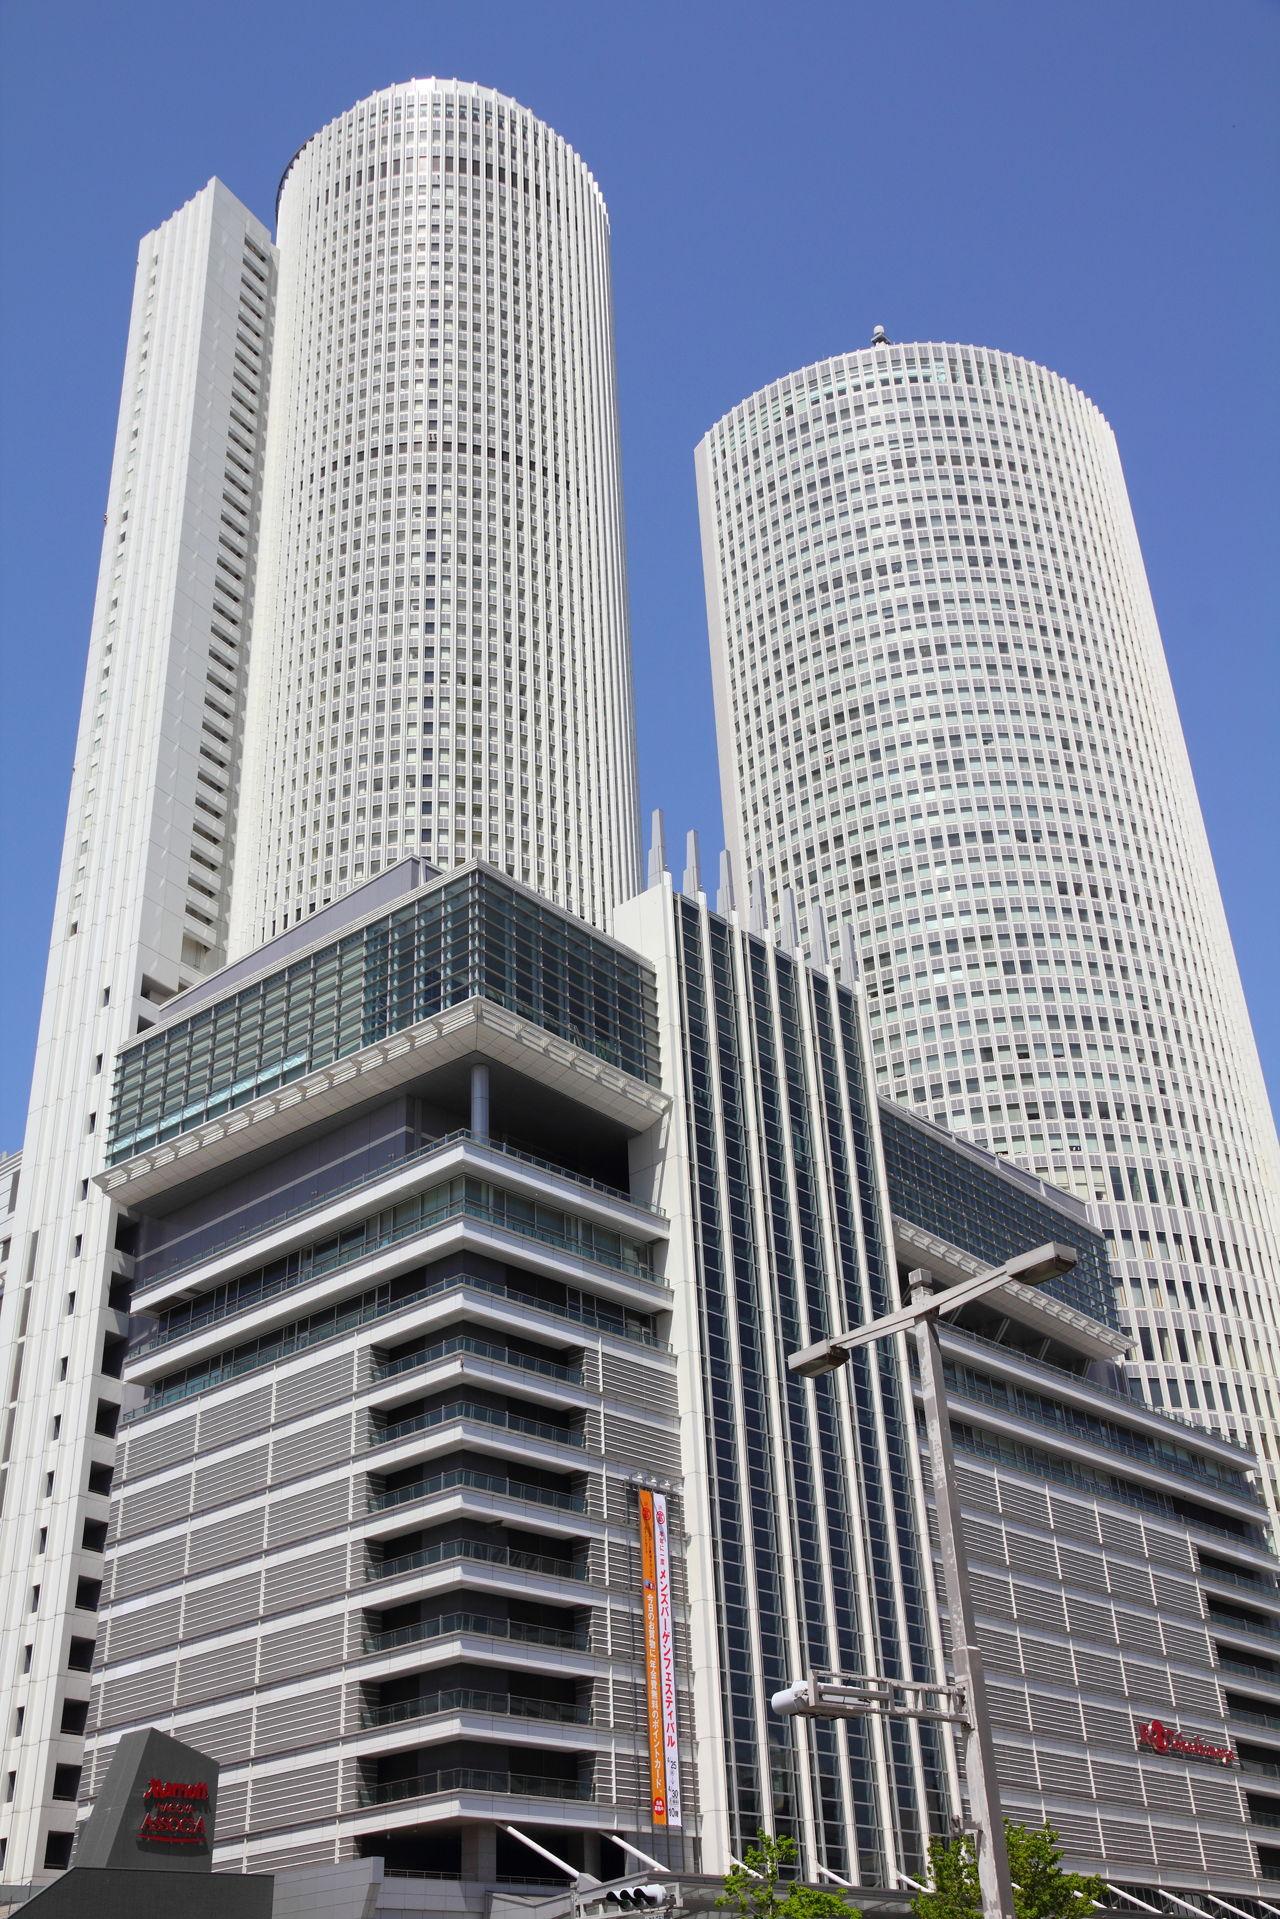 architecture postmodern characteristics stylistic examples nagoya